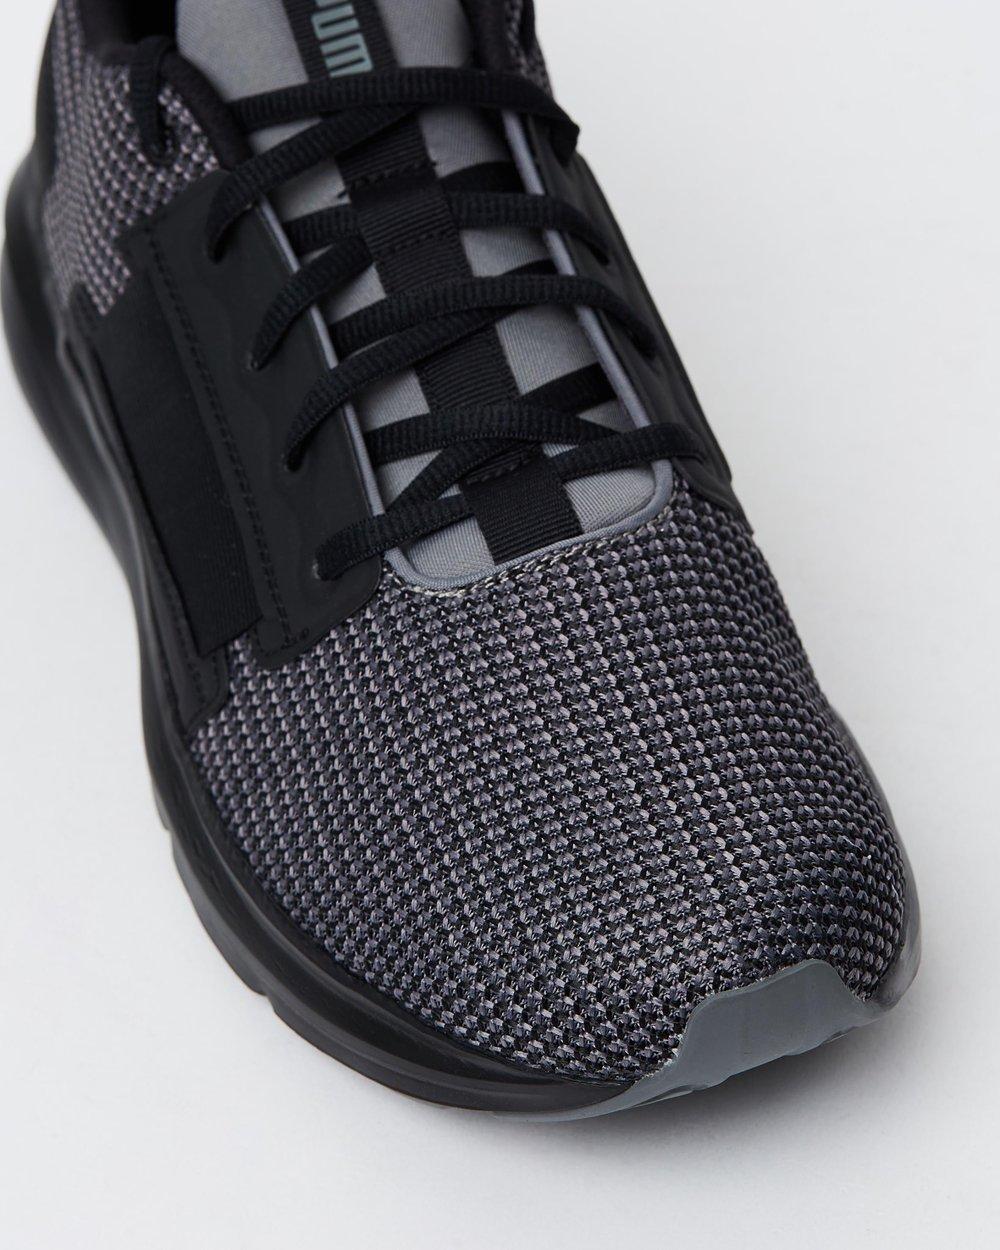 7ba60c18c987 Enzo Street Knit Running Shoes - Men s by Puma Online